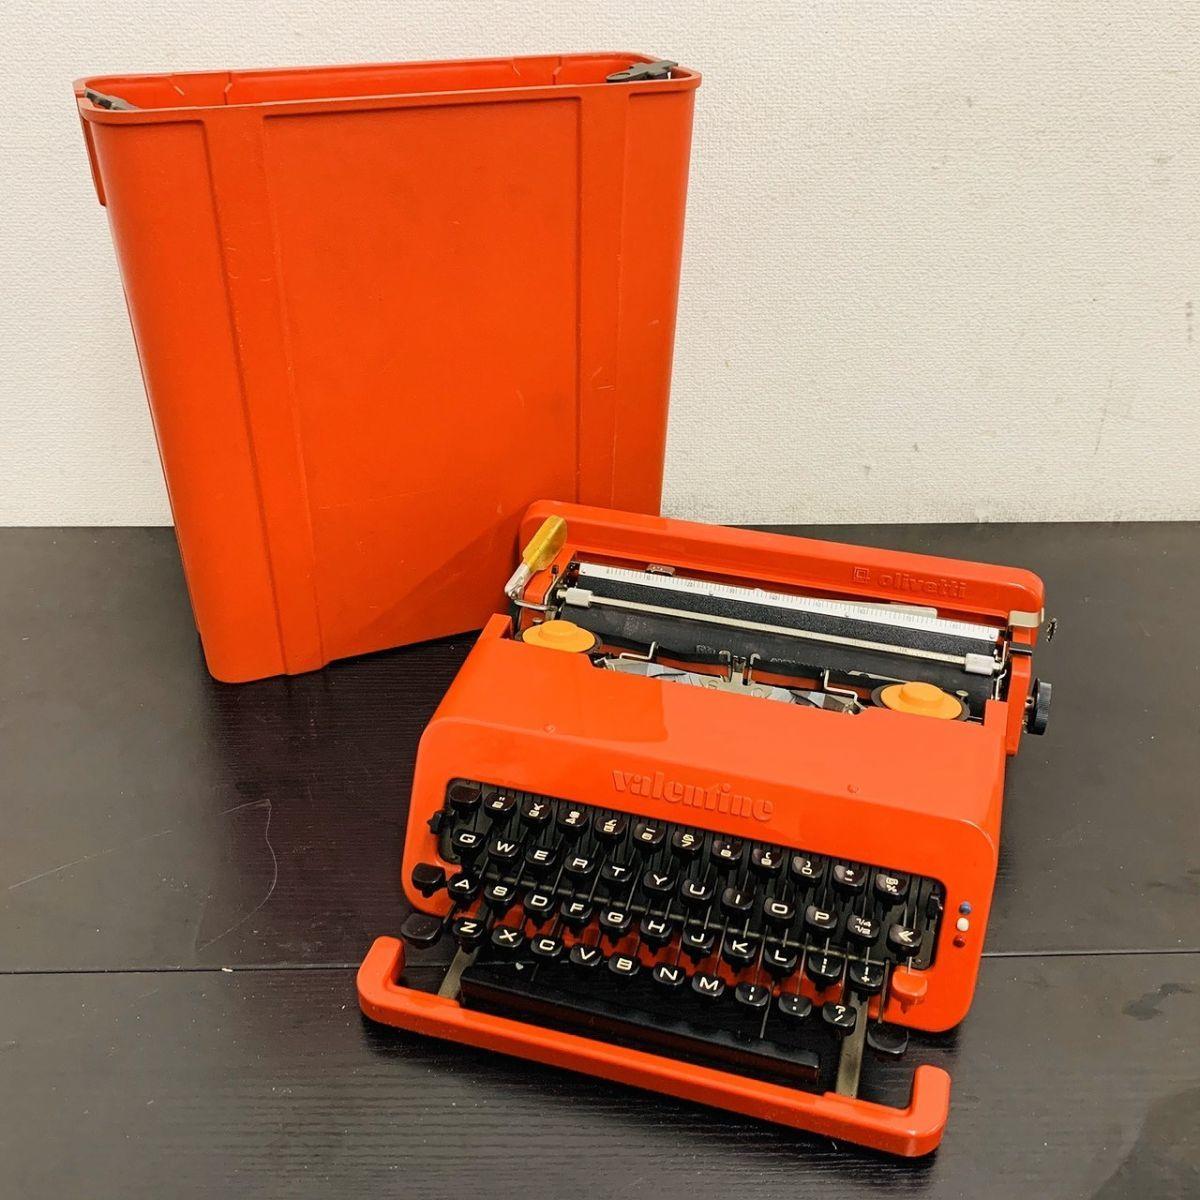 Y212-I13-1931 Olivetti オリベッティ Valentine バレンタイン タイプライター アンティーク ④